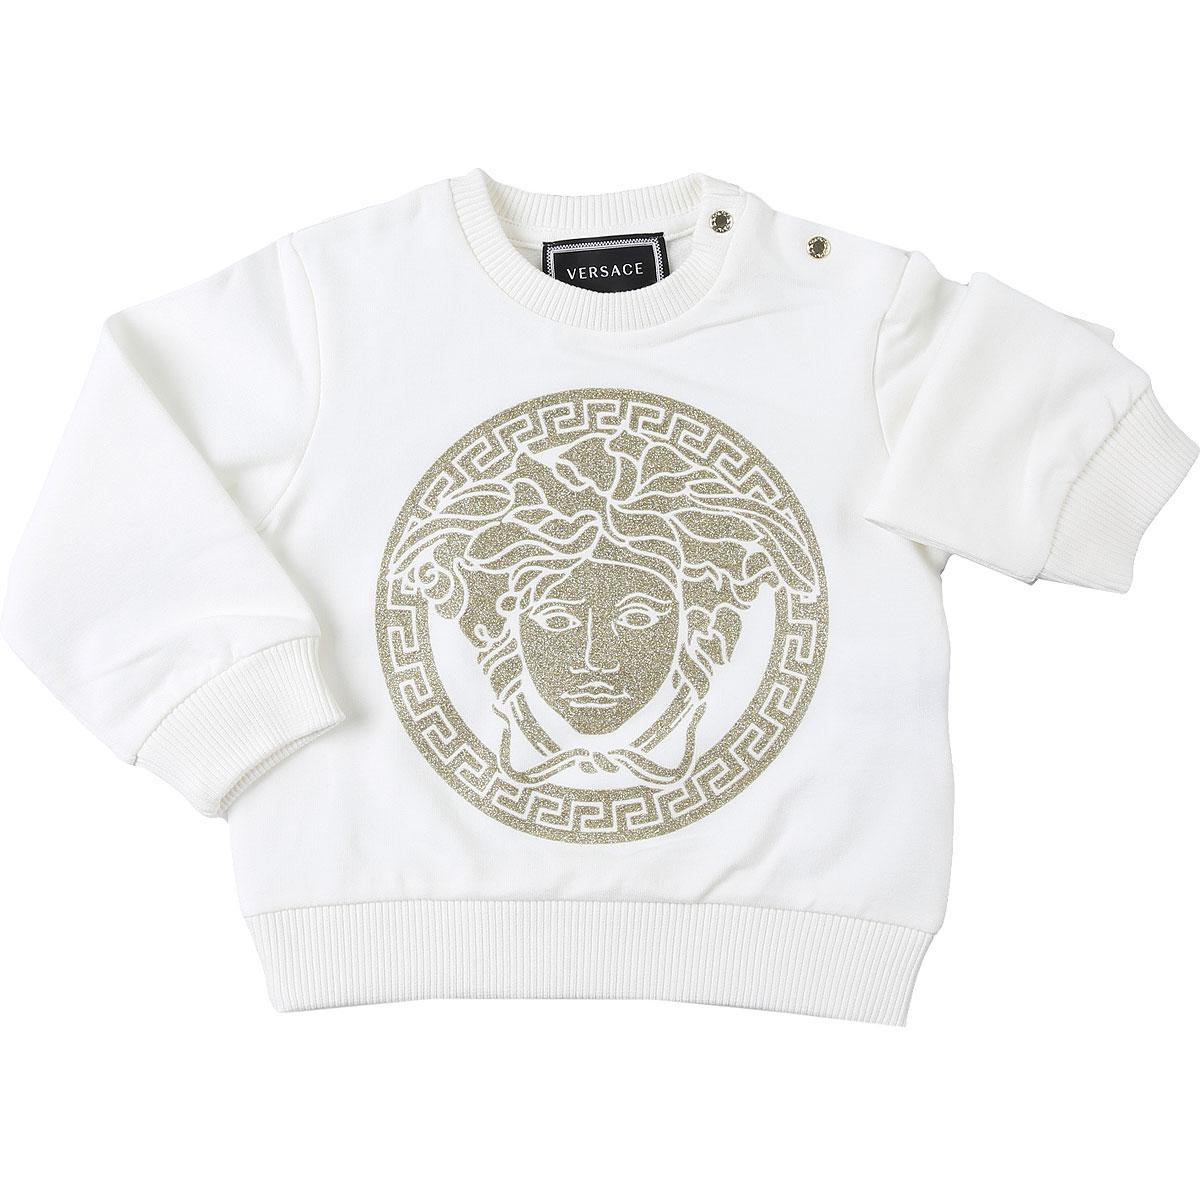 Versace Baby Sweatshirts & Hoodies for Girls On Sale, White, Cotton, 2019, 12M 18M 24M 2Y 3Y 6M 9M